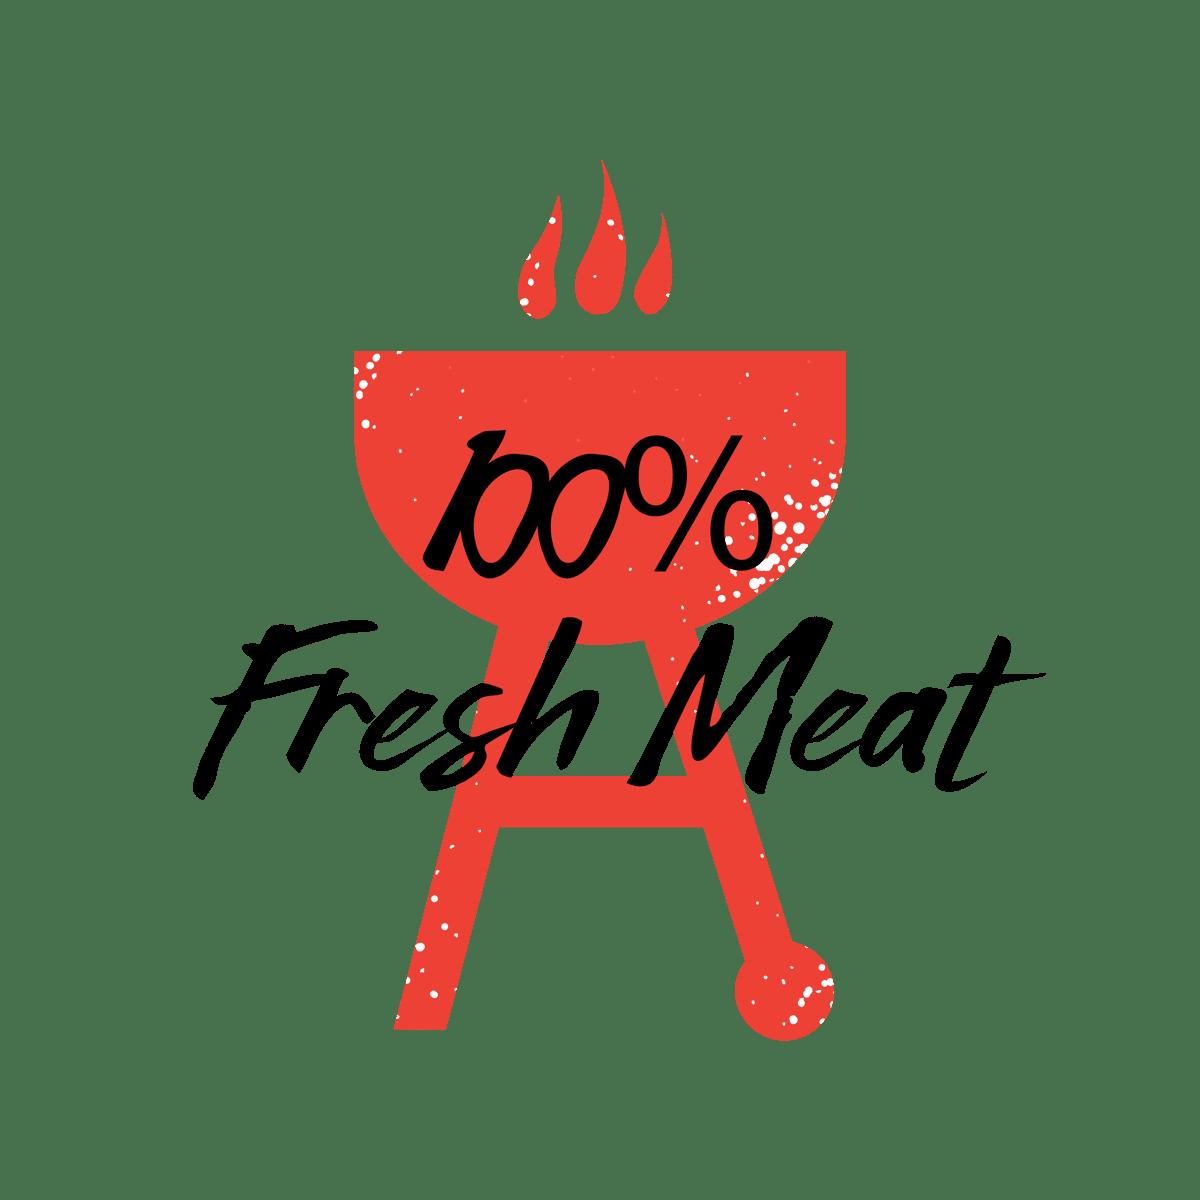 100% Fresh Meat